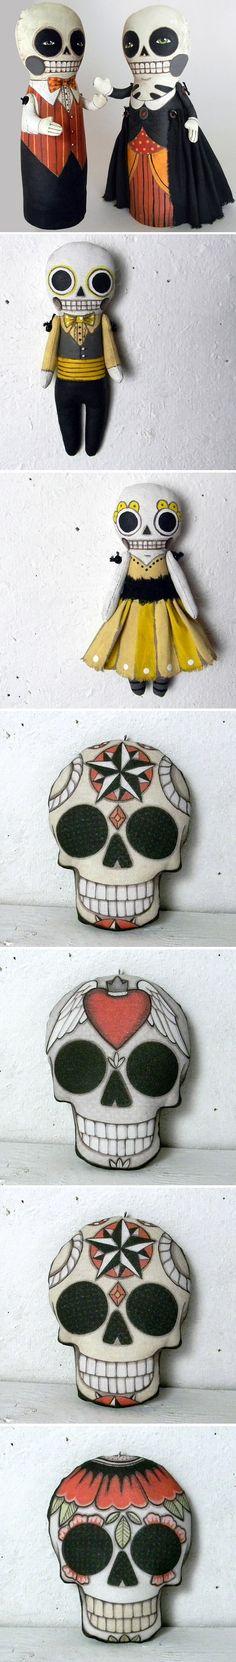 Skeleton Doll-- Day of the Dead Halloween-- Original Contemporary Folk Art    http://www.etsy.com/listing/81588801/skeleton-doll-day-of-the-dead-halloween